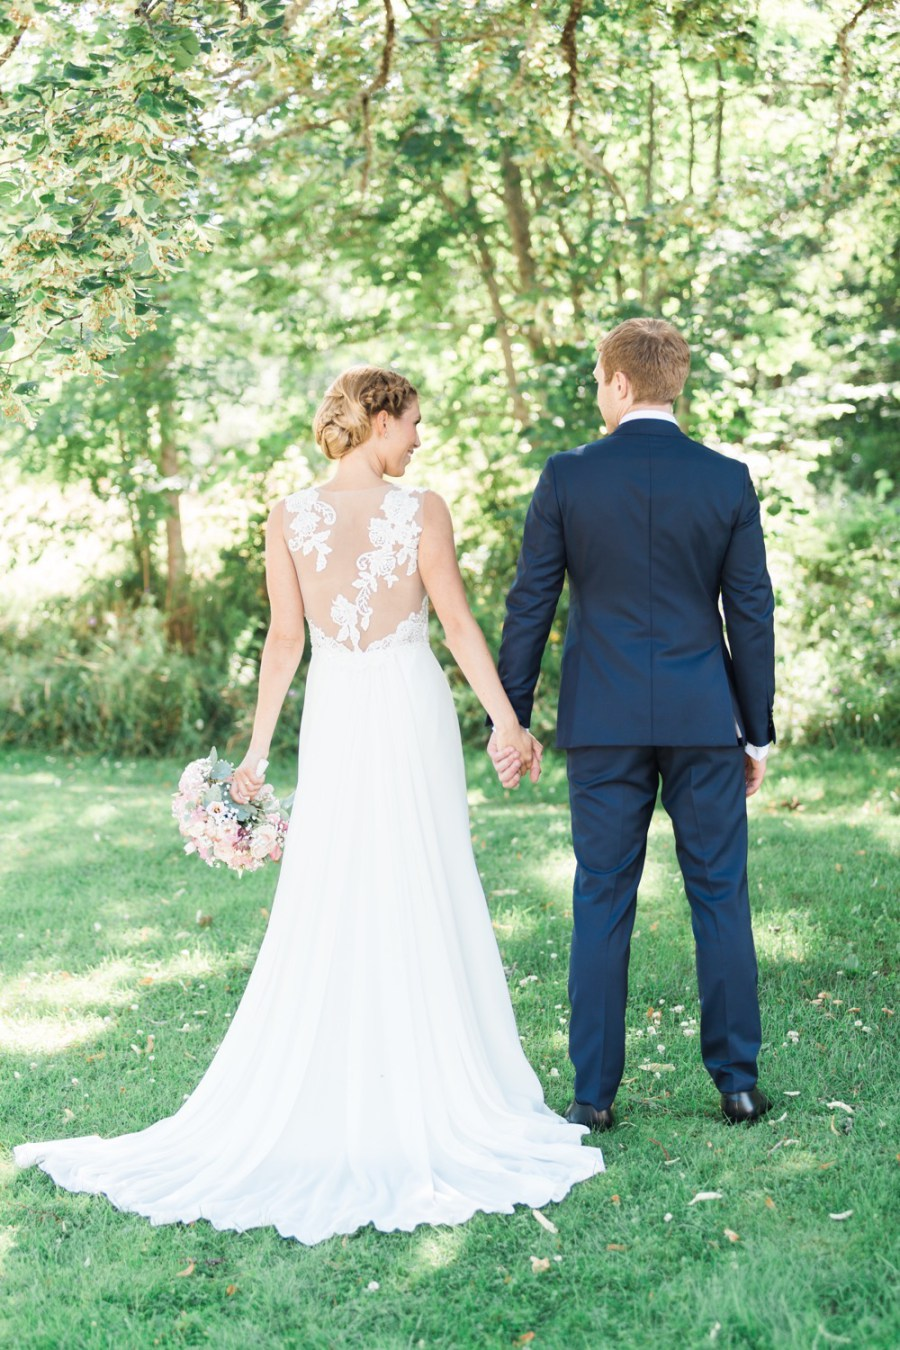 elegant-swedish-wedding-by-emelie-petre50